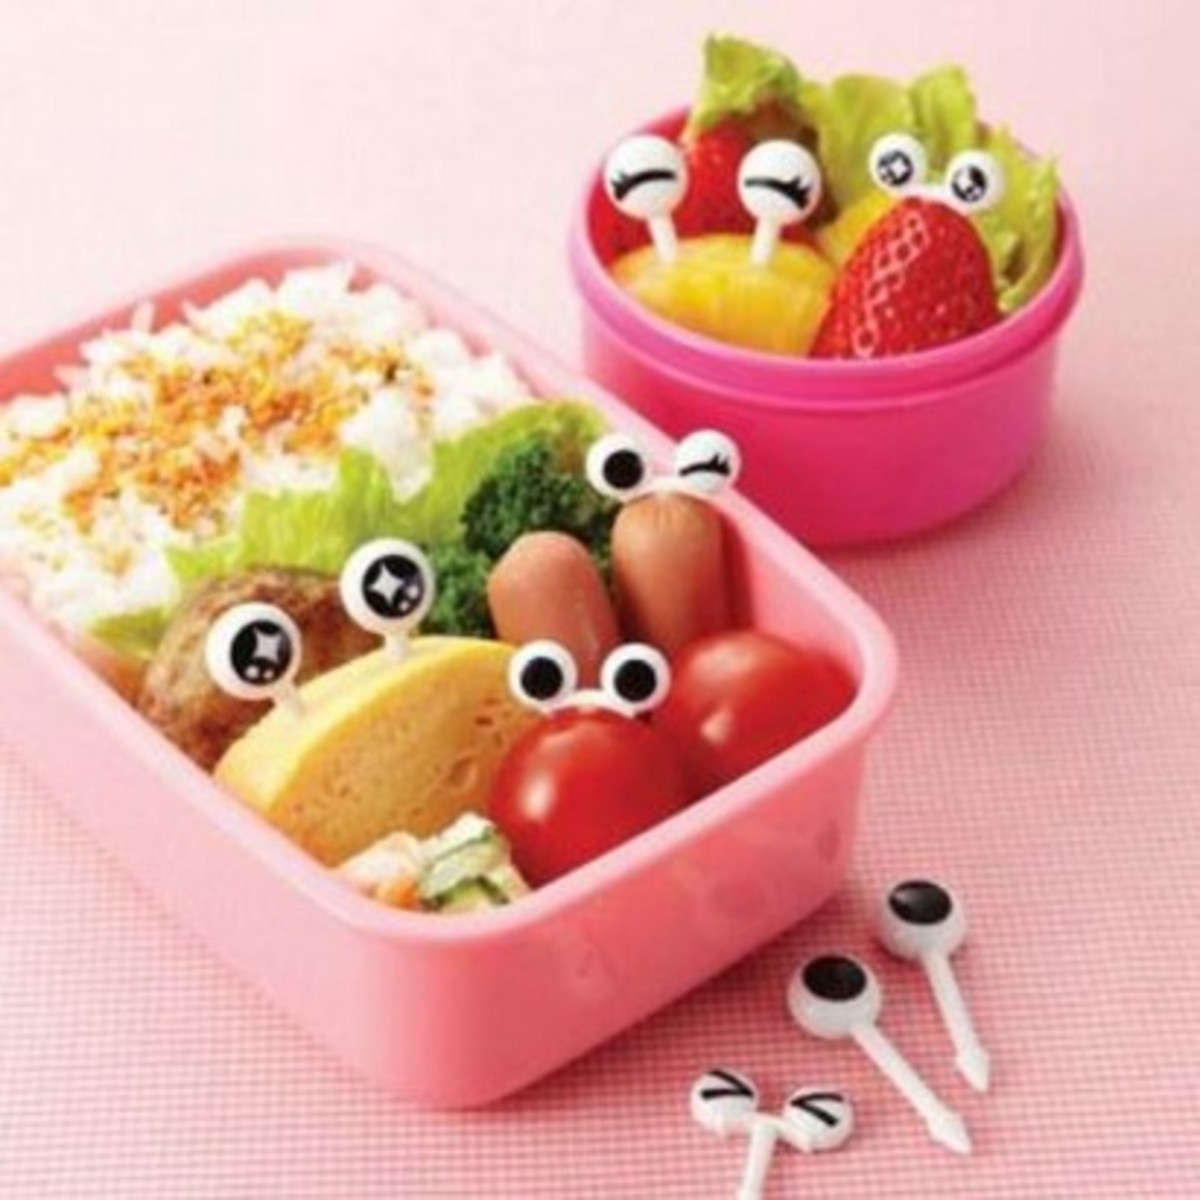 lunch box accessories eyeballs